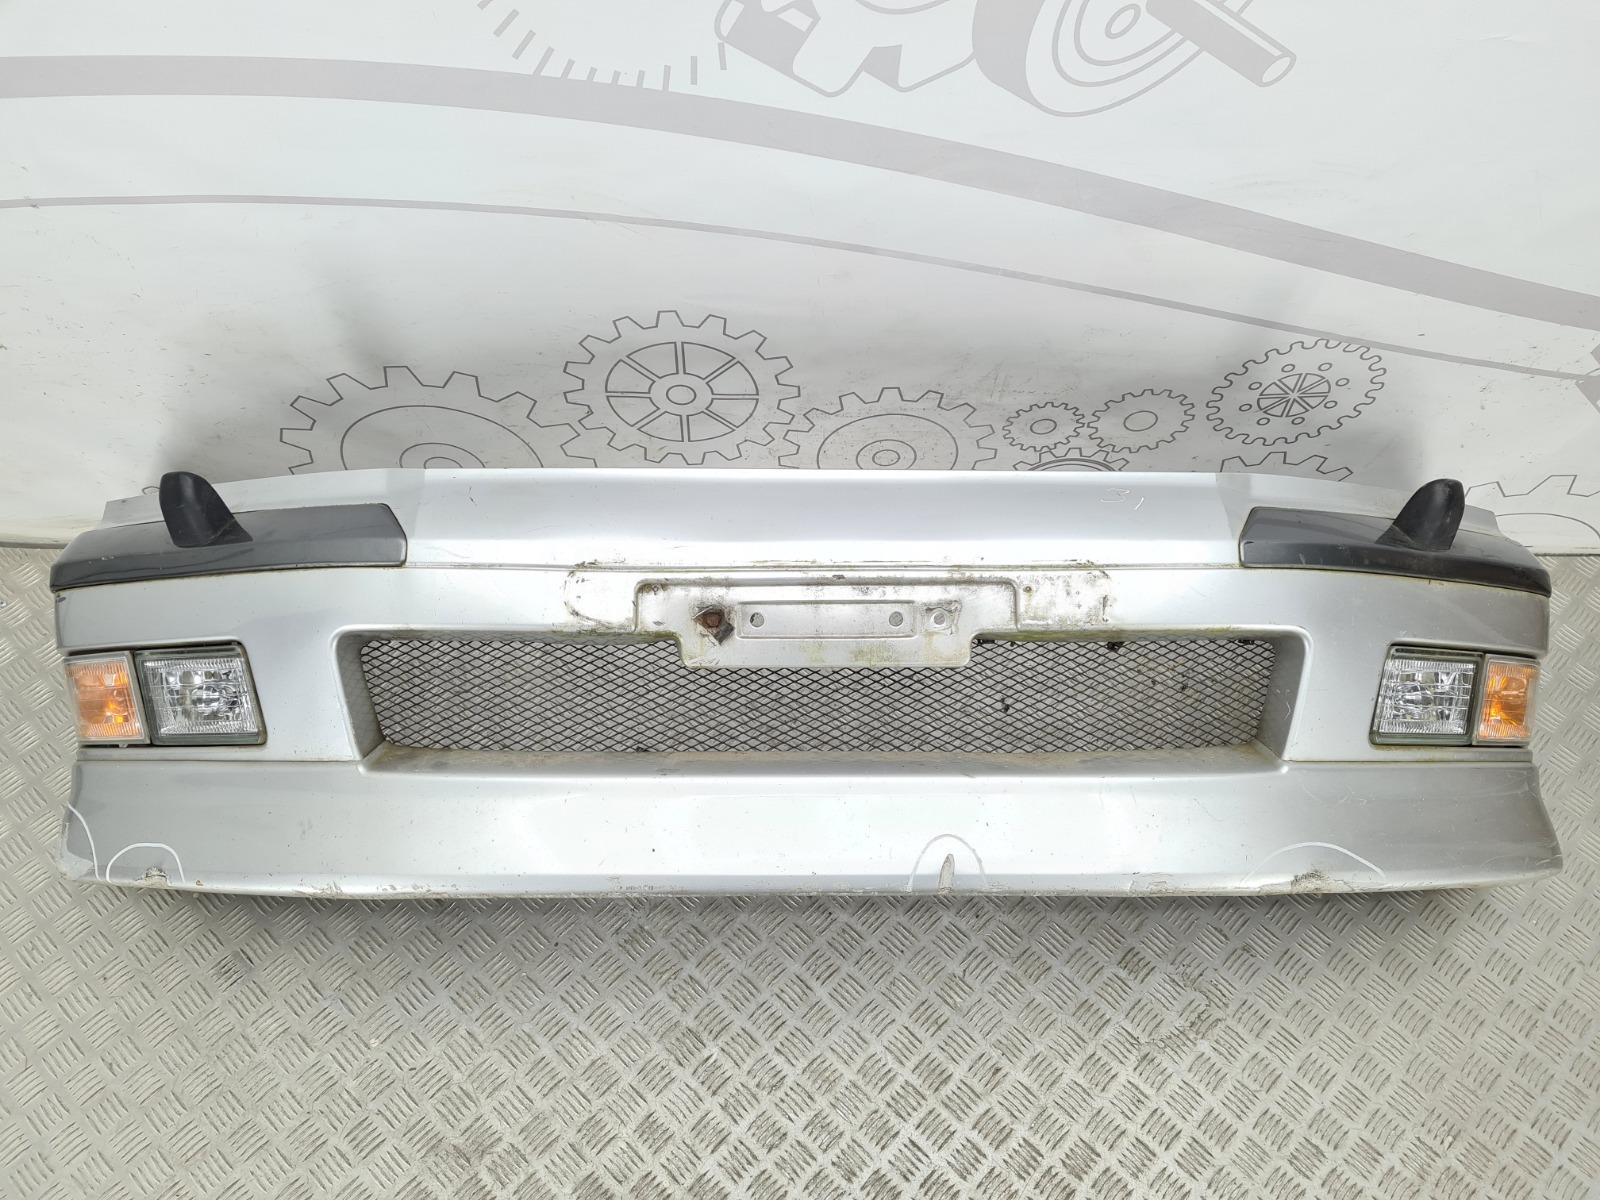 Бампер передний Mitsubishi Space Wagon 3 2.4 I 2002 (б/у)